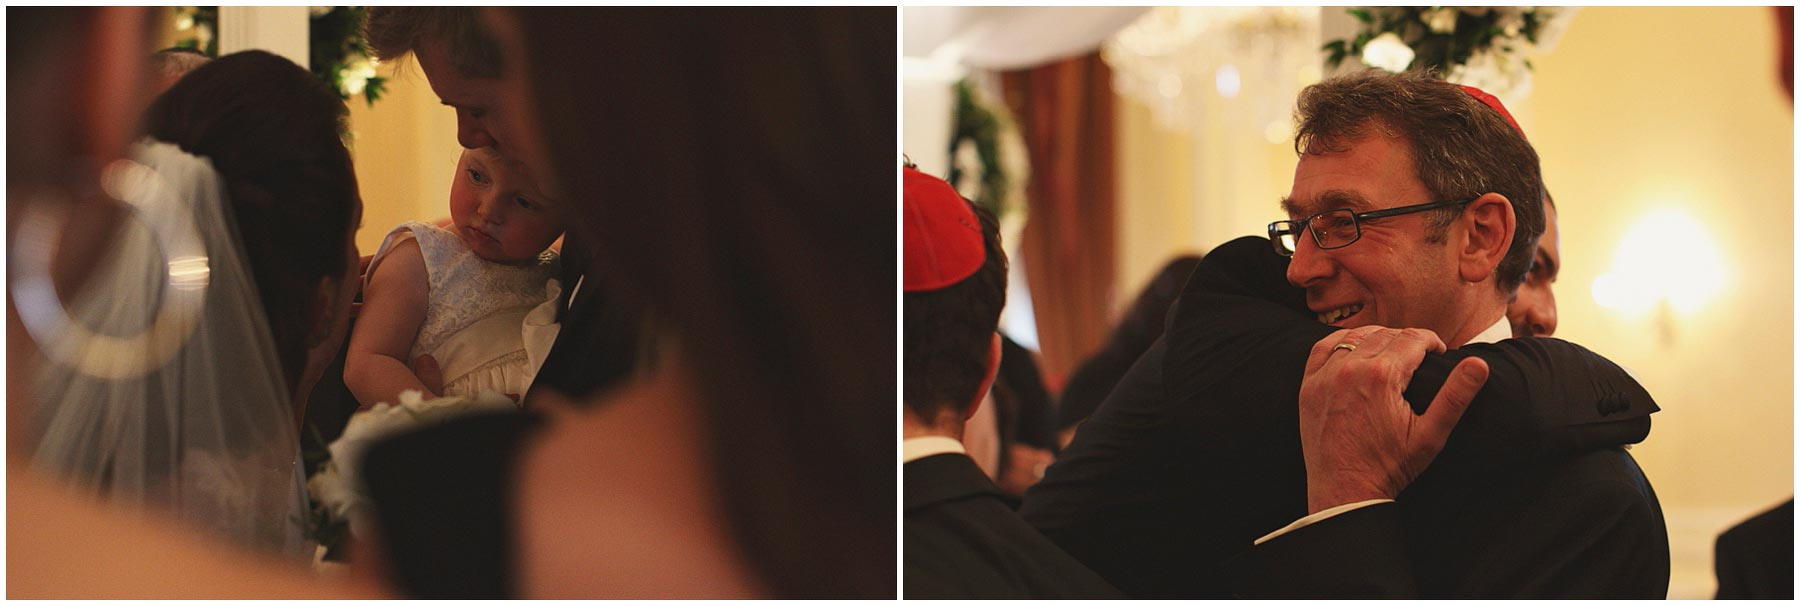 Jewish-Wedding-Photography_0081